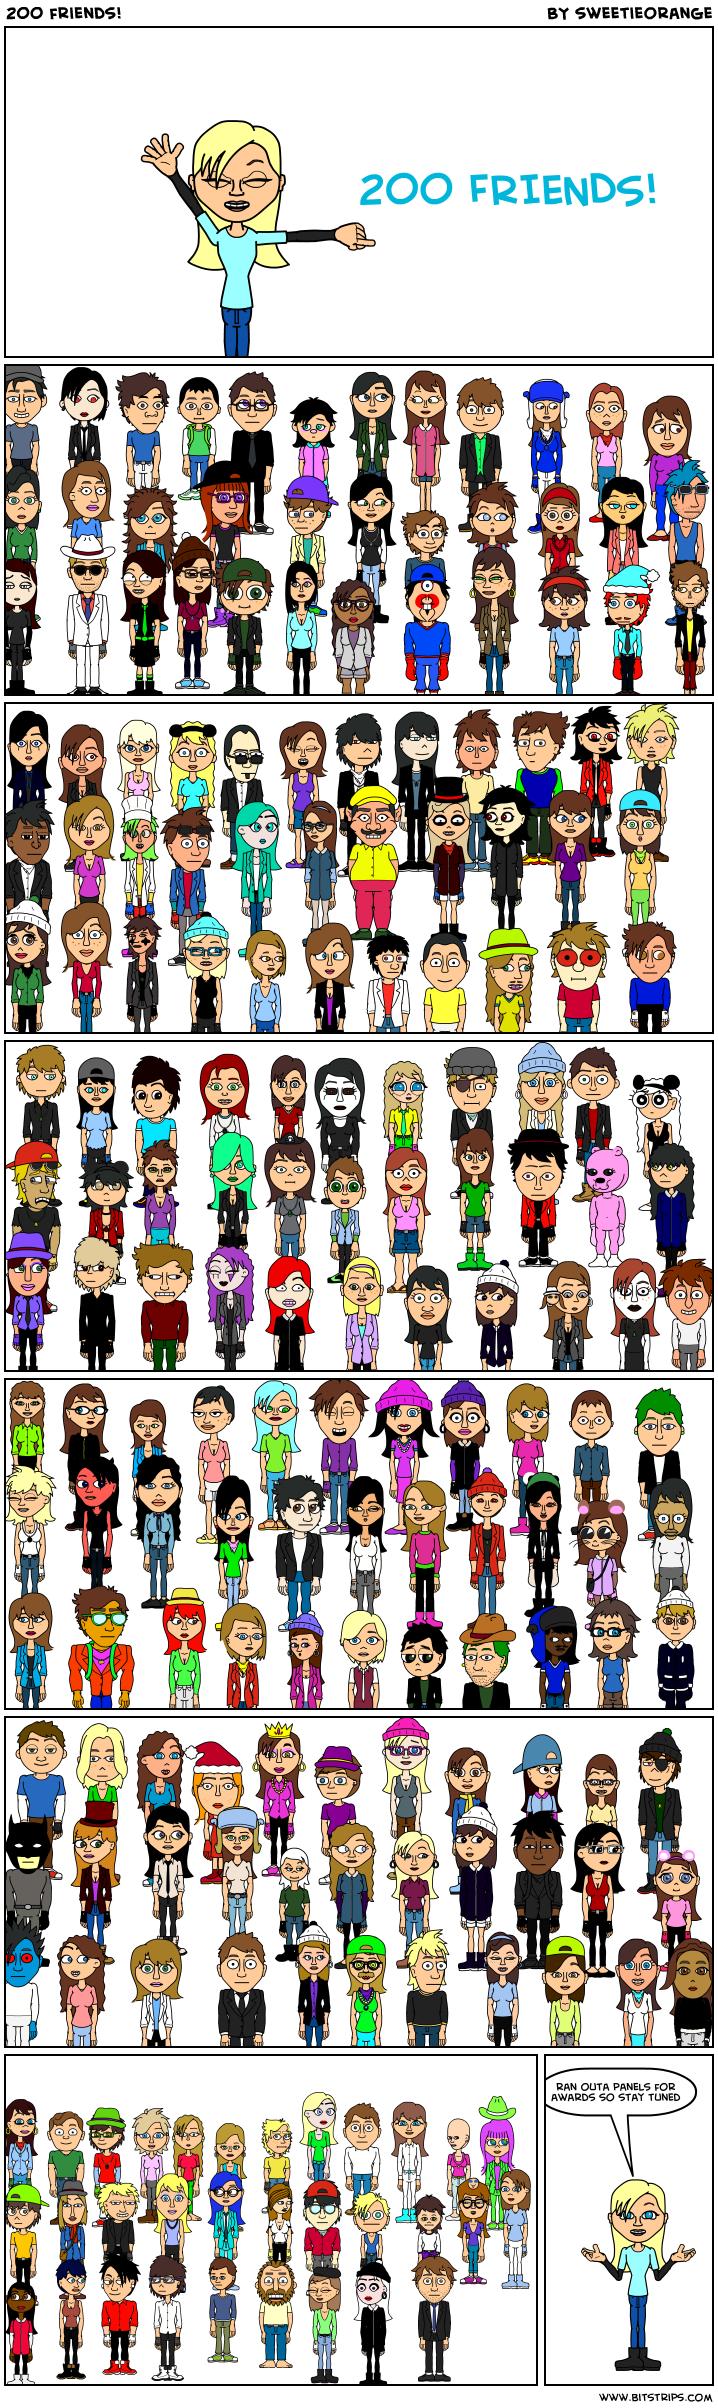 200 friends!